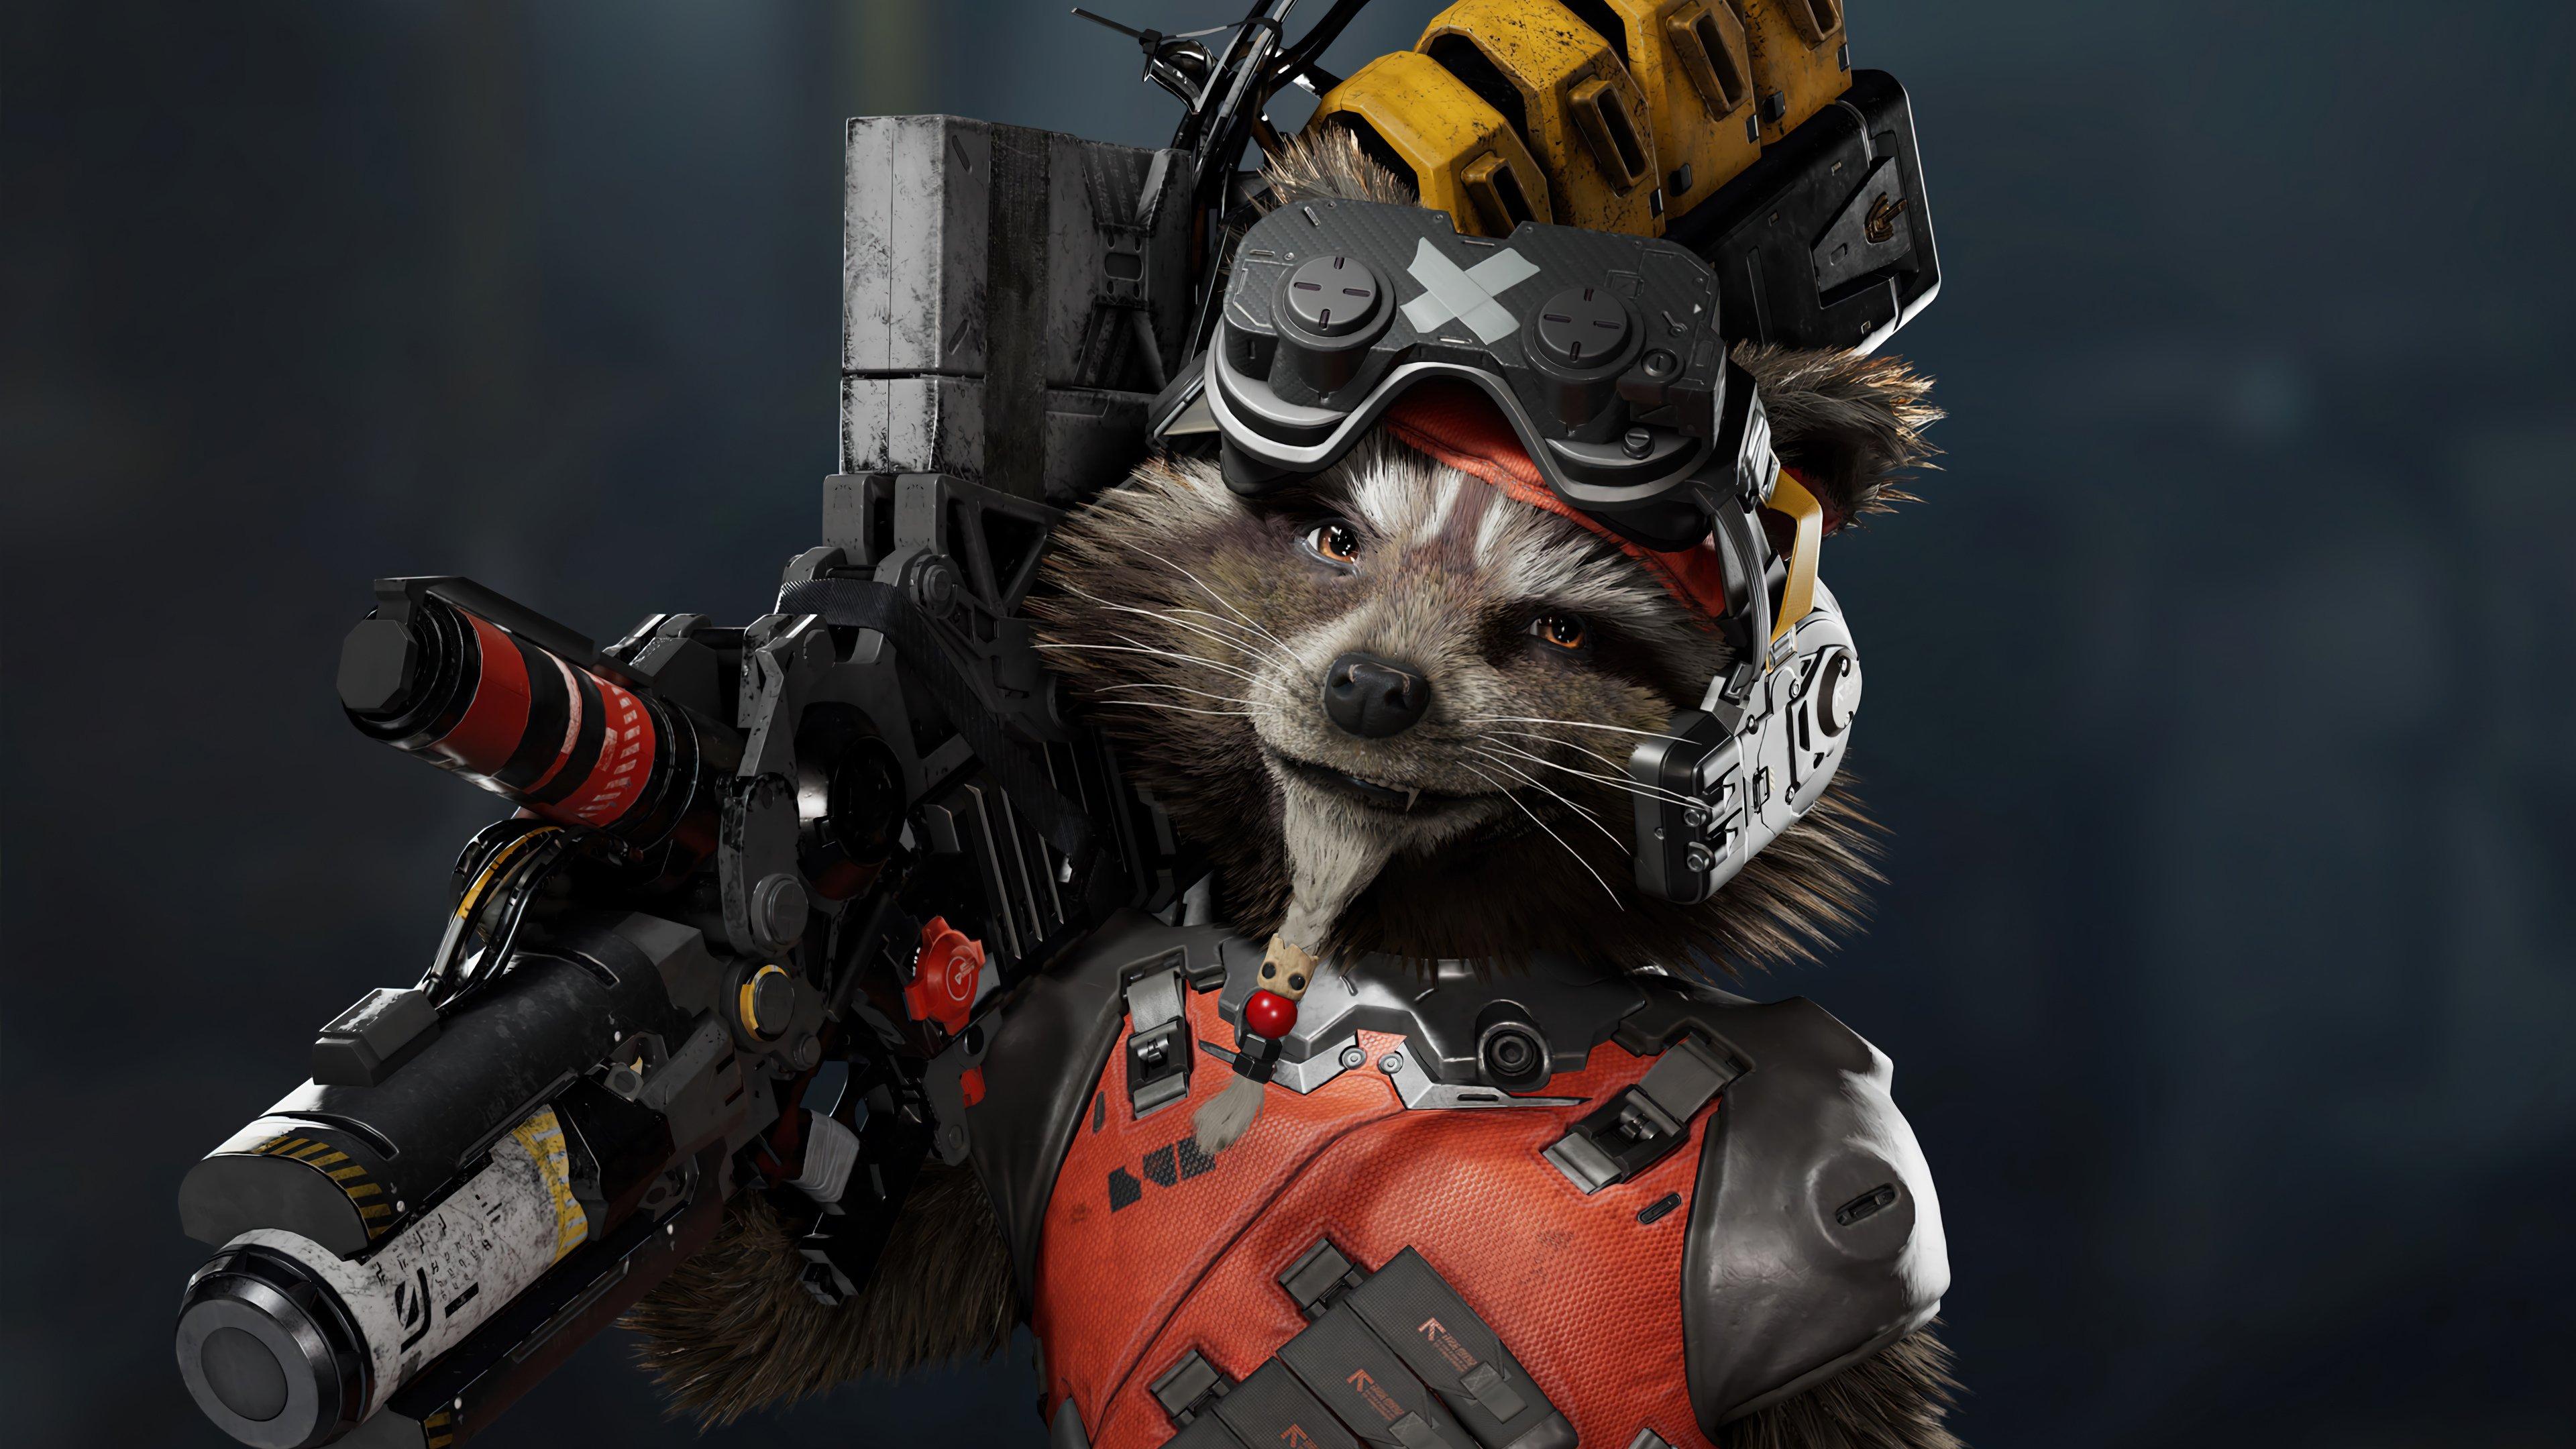 Wallpaper Rocket Raccoon Marvels Guardians of the galaxy